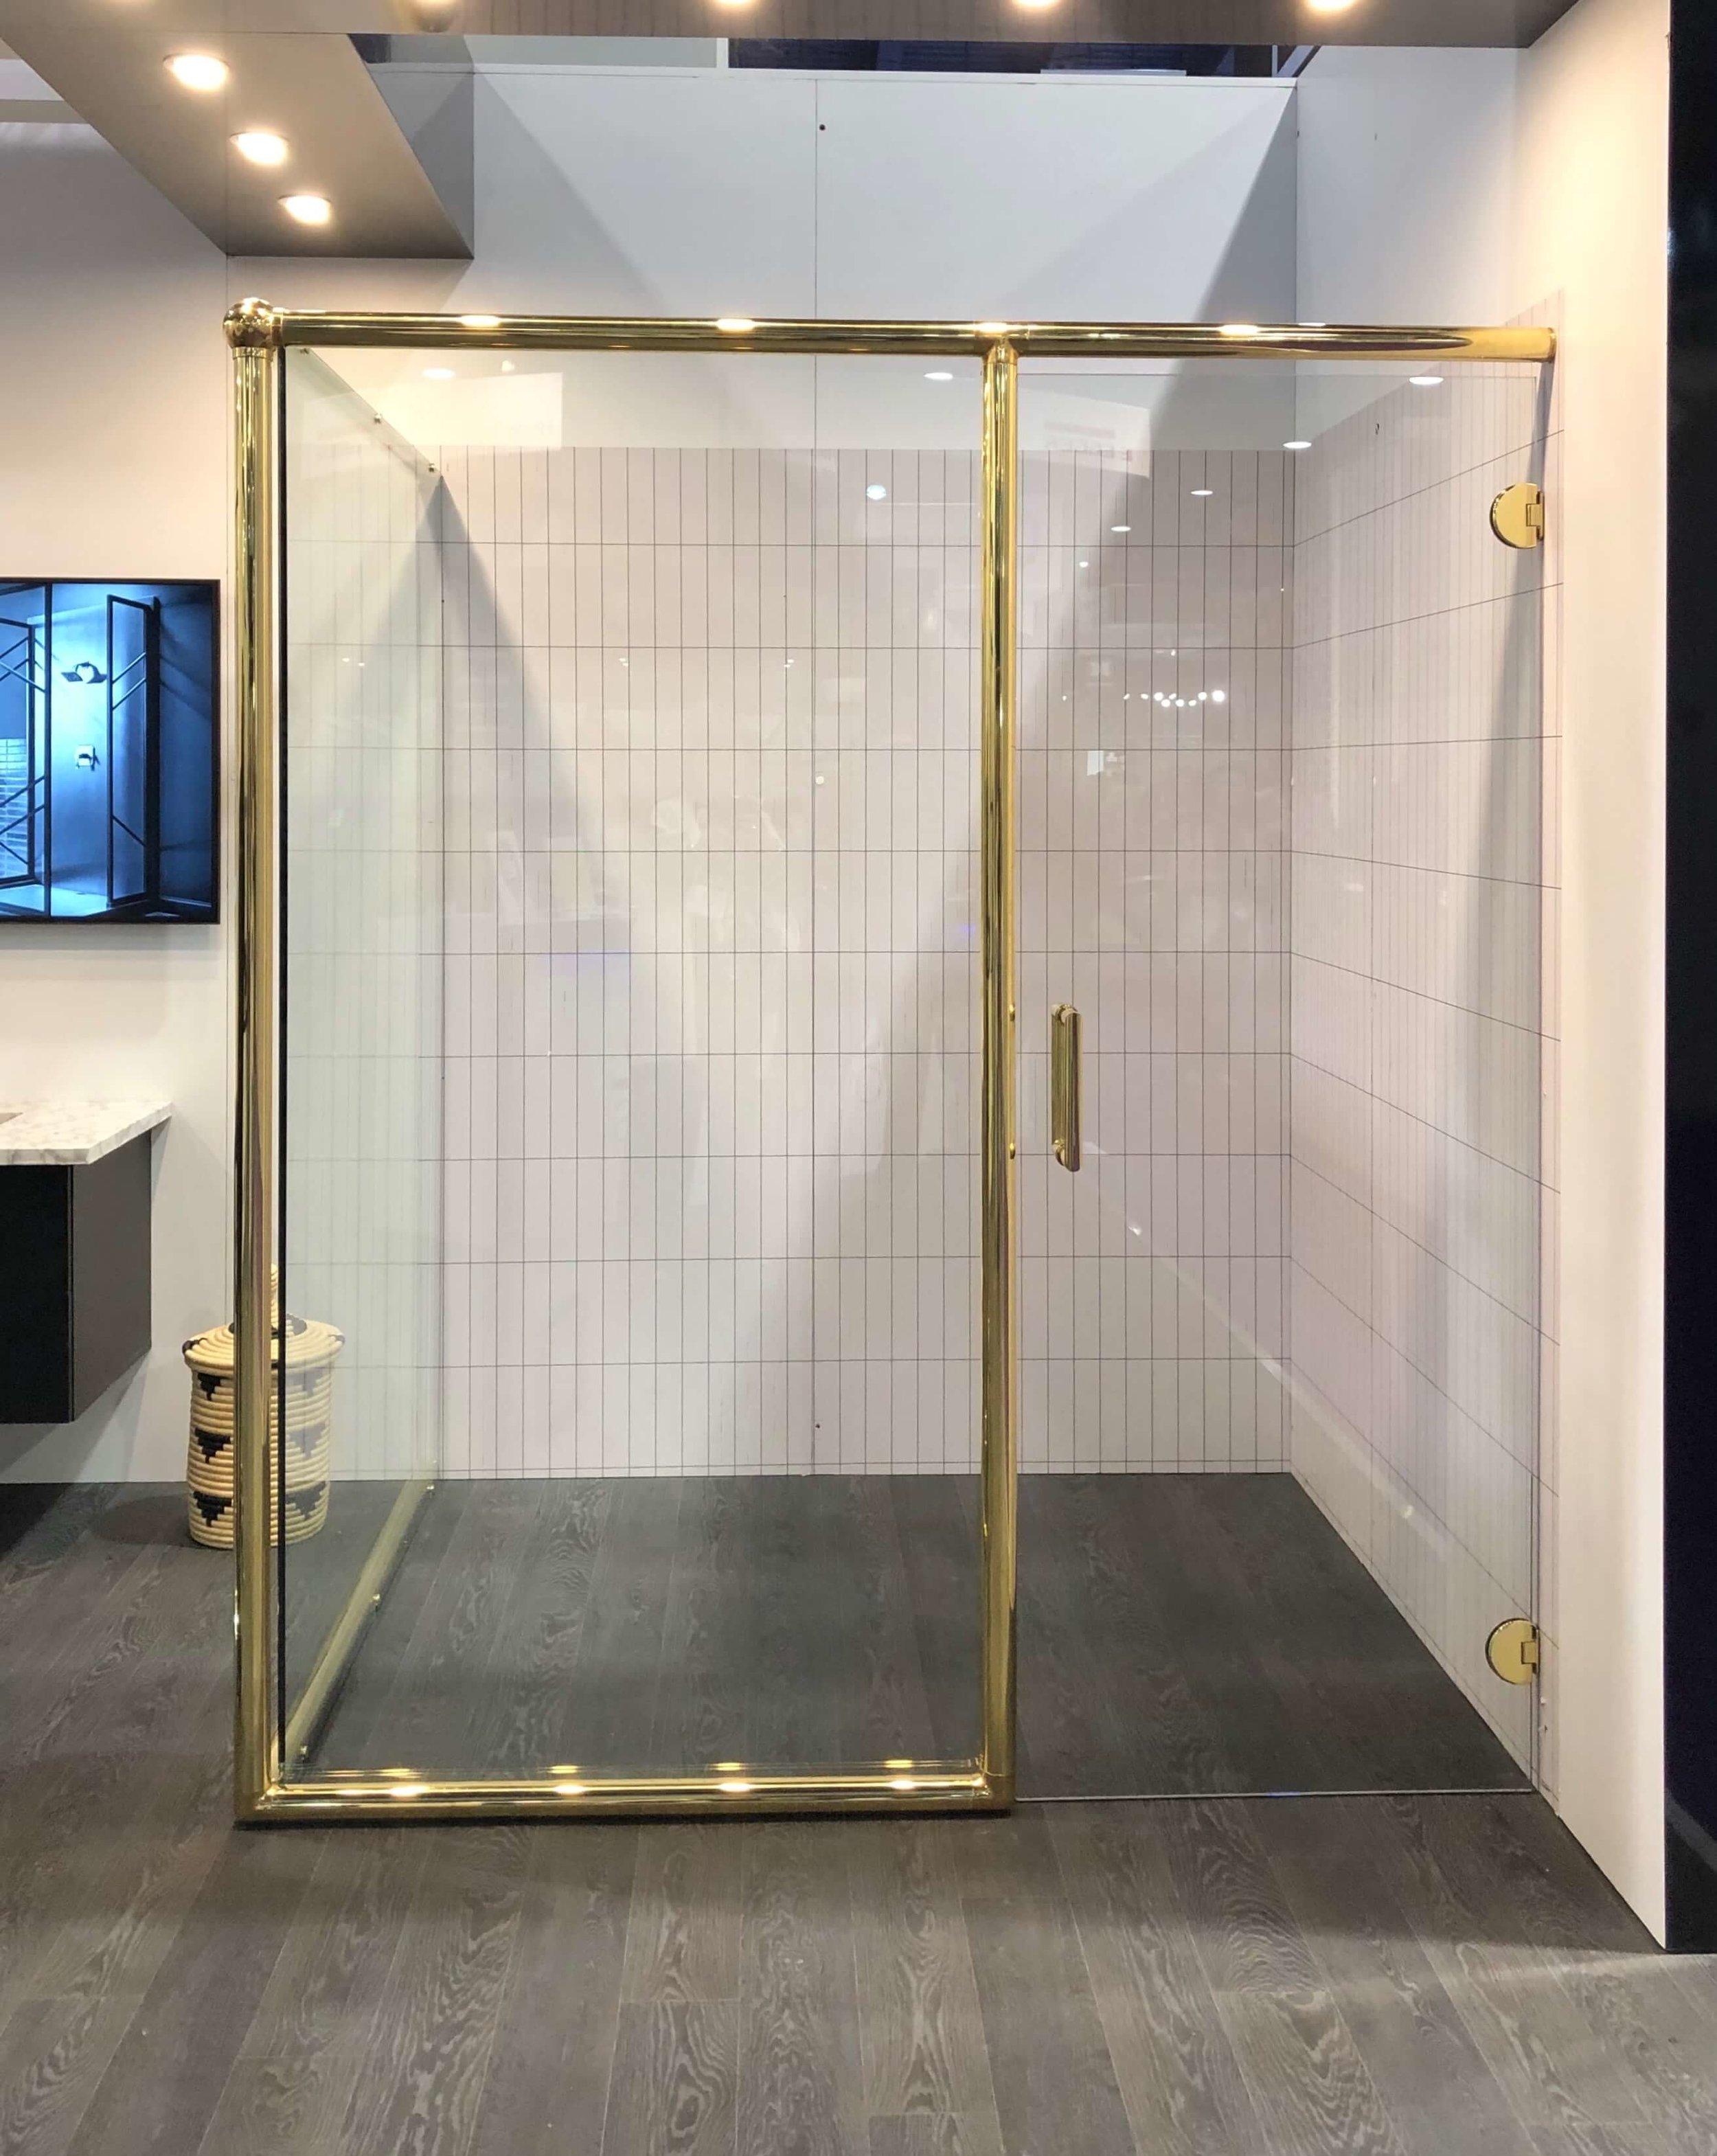 Vintage brass look glass shower enclosure | KBIS 2019 Surfaces Trends